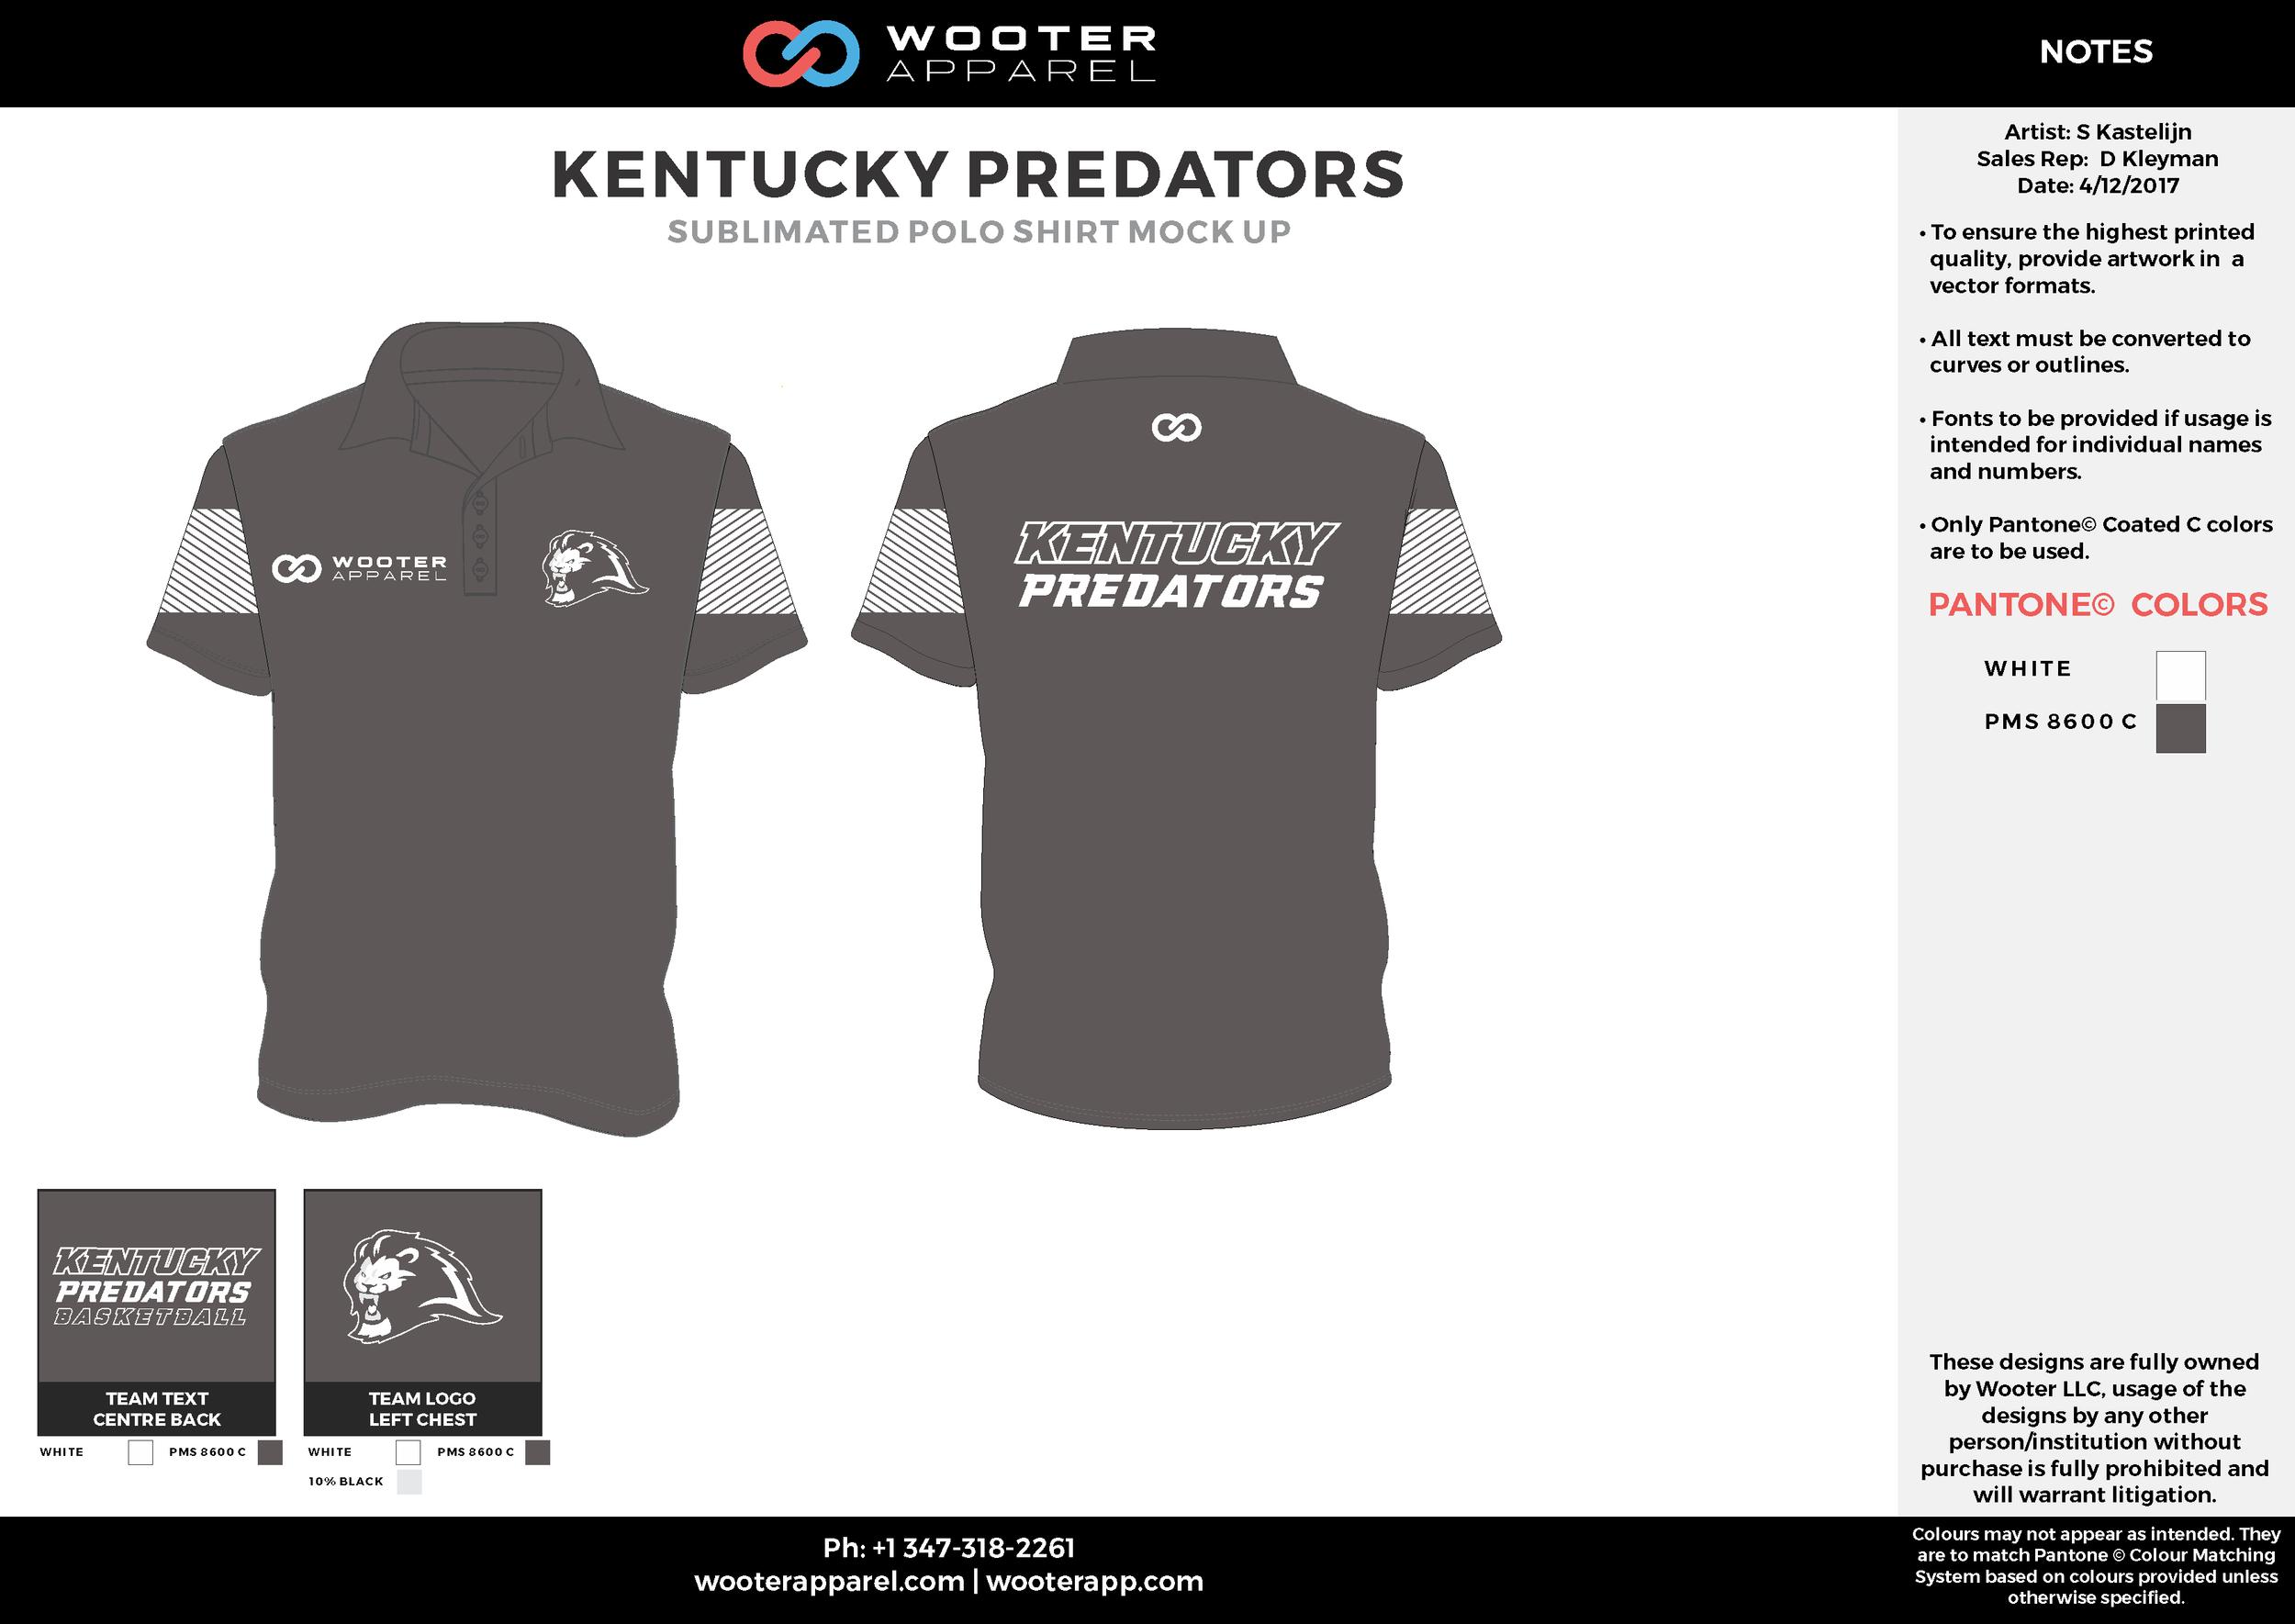 KENTUCKY PREDATORS black white Polo Shirts